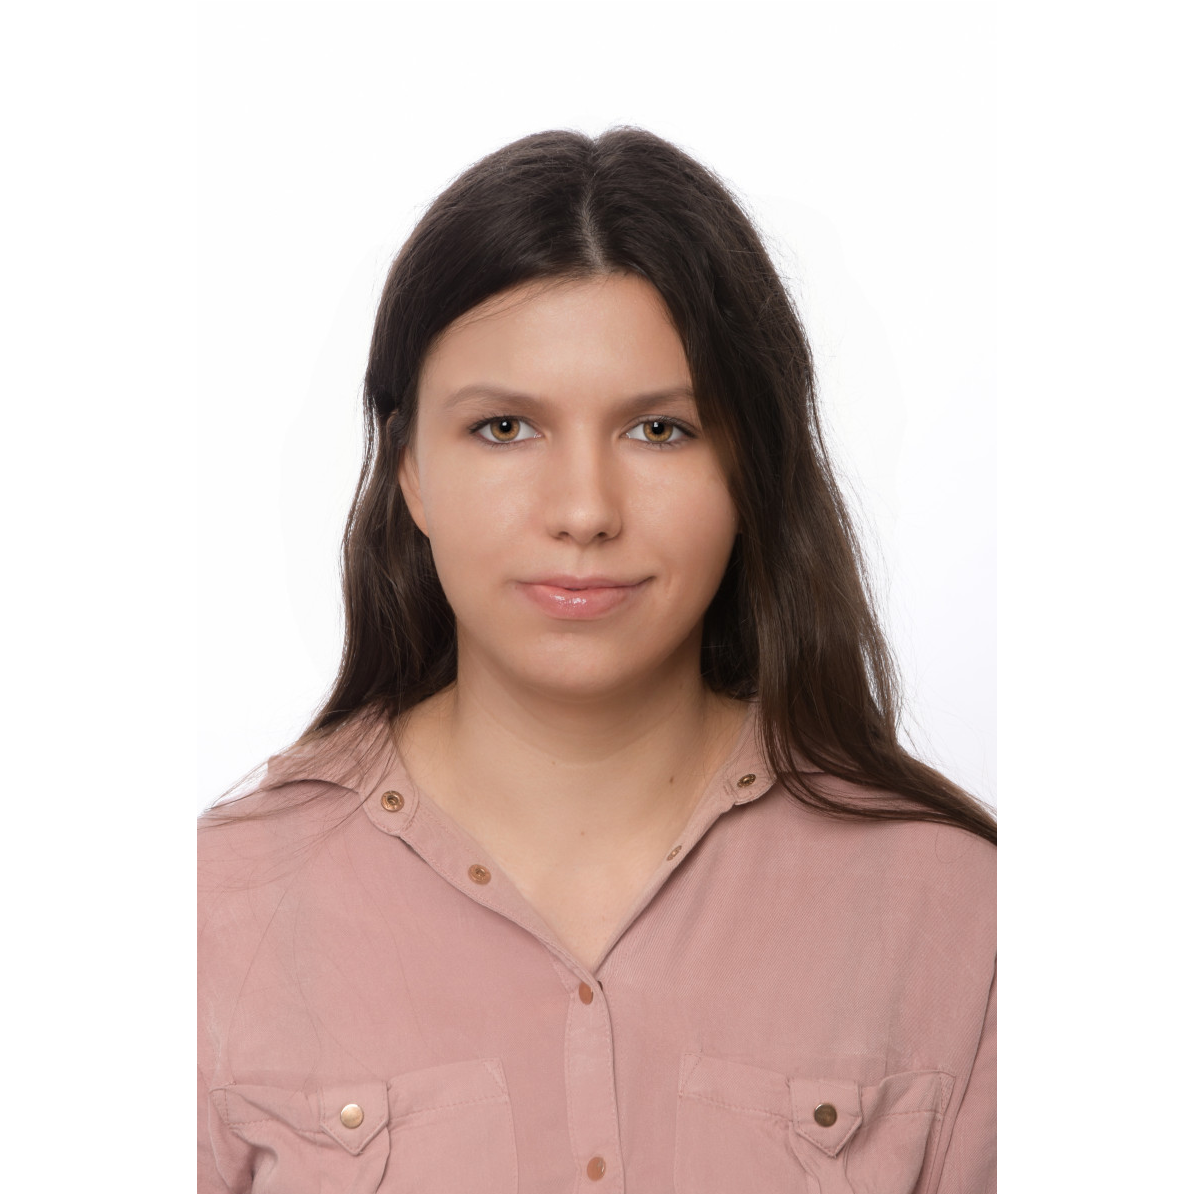 Martyna Serafin - Peciak